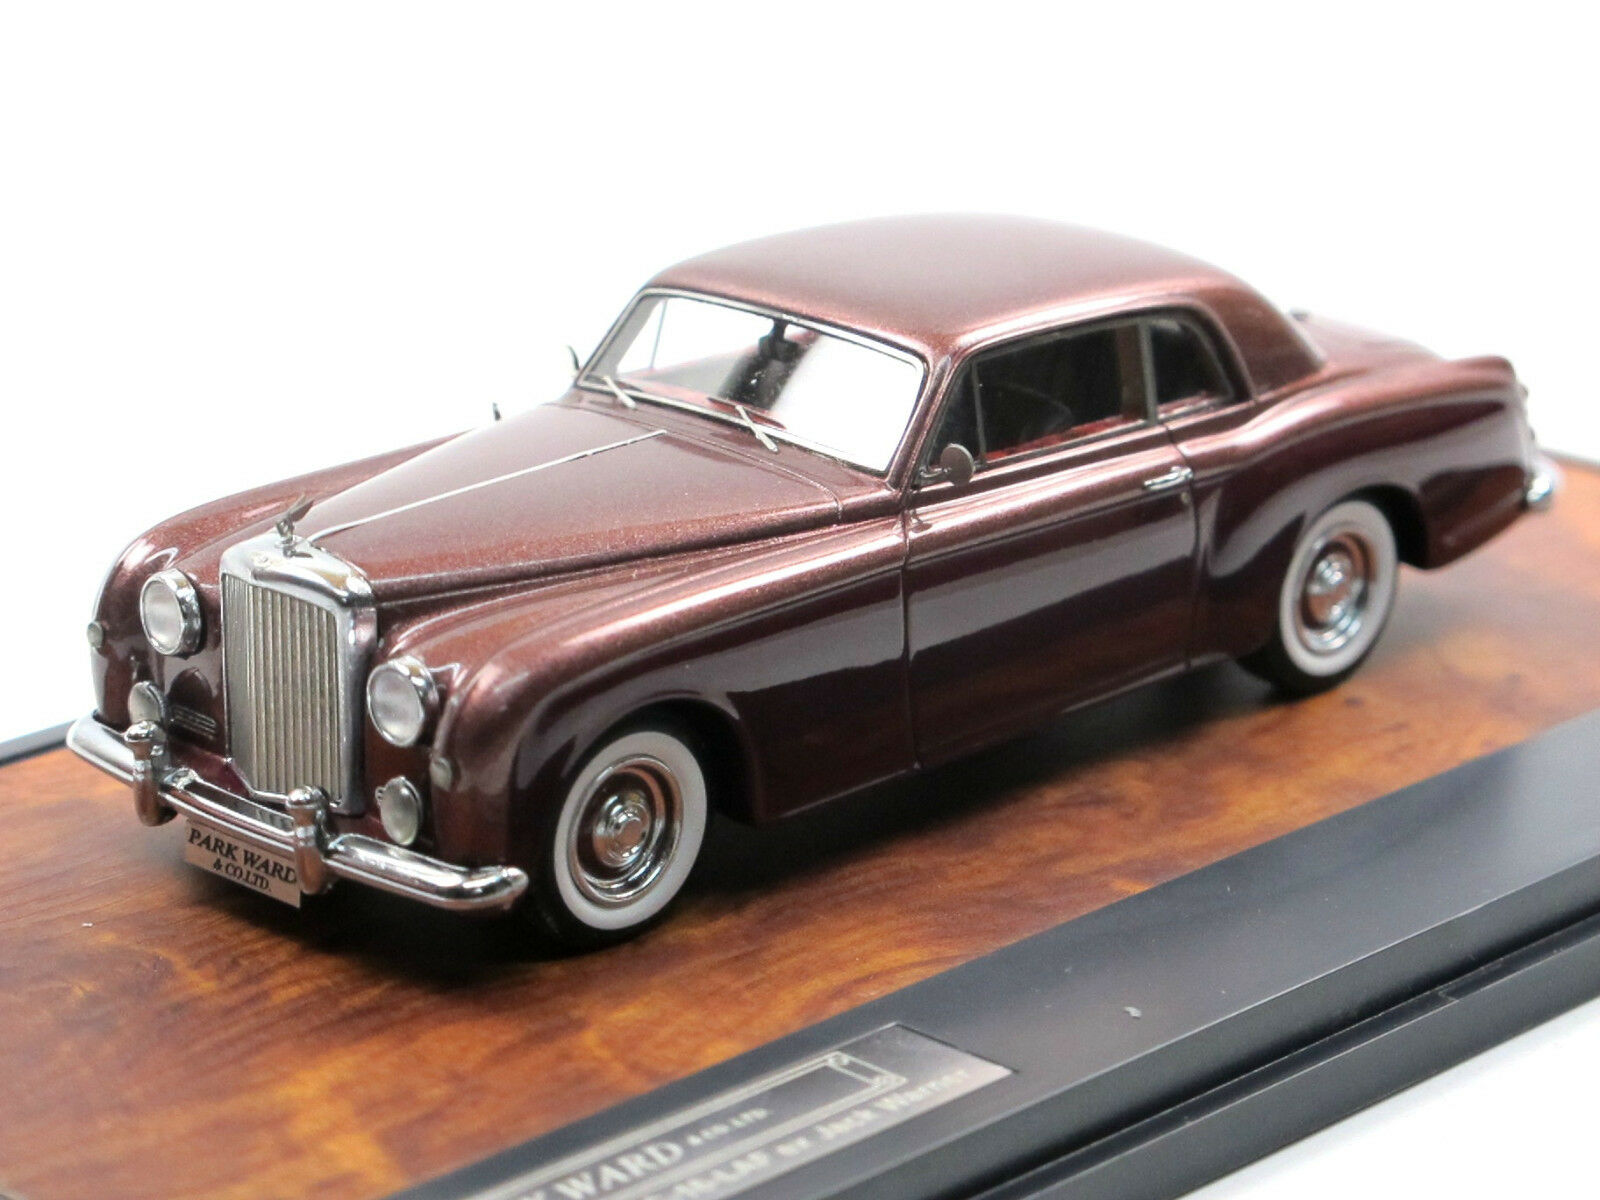 Matriz 1956 Bentley s1 continental Park Ward fhc ex. Jack Warner Maroon 1 43